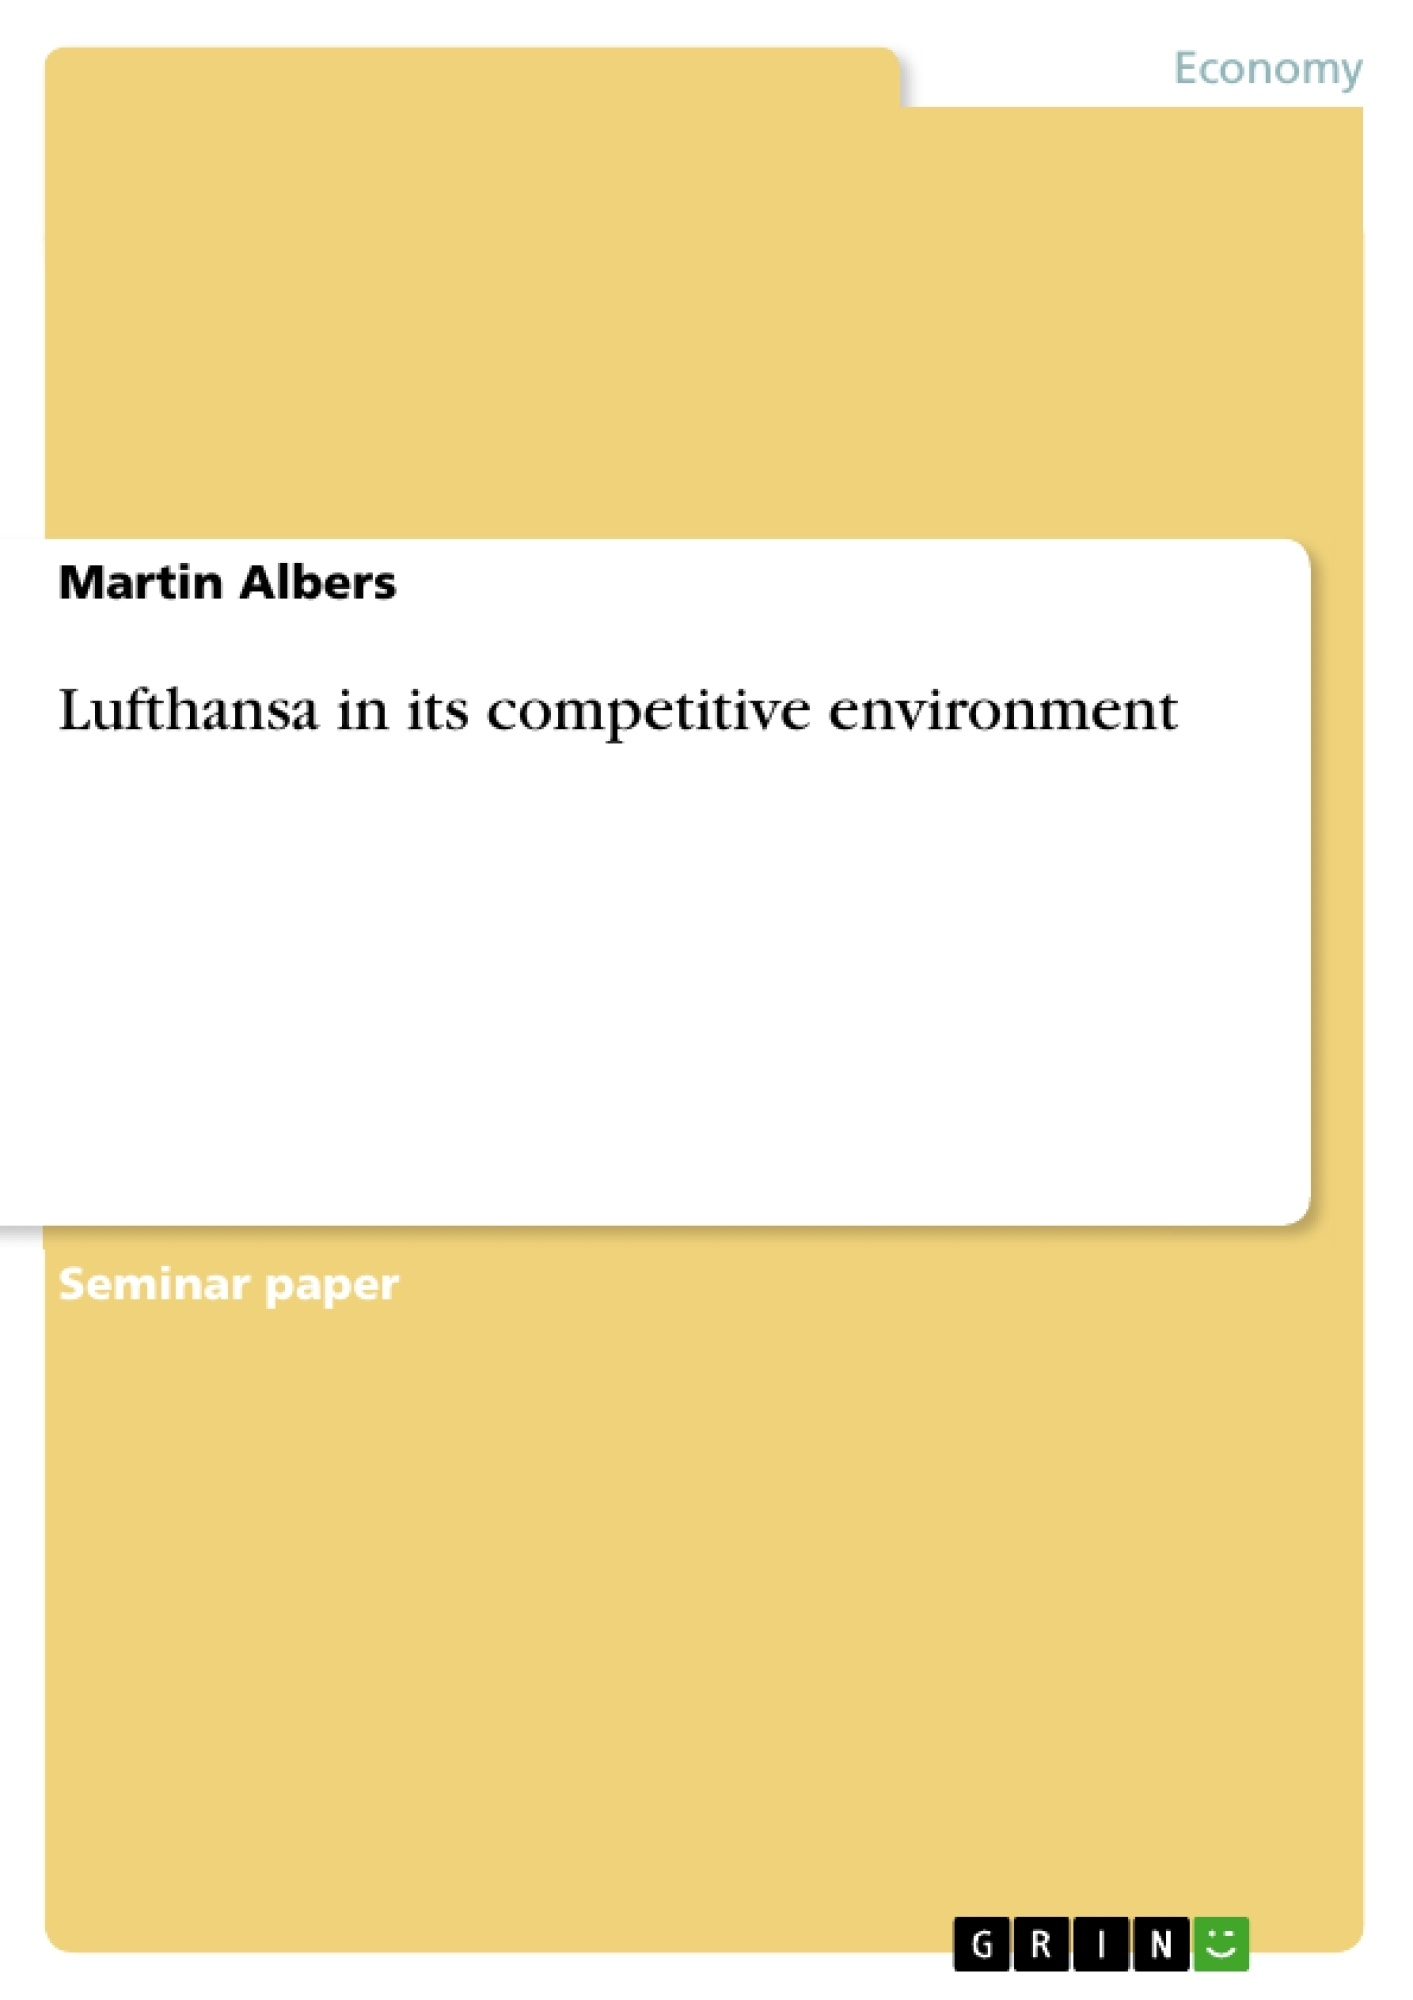 deutsche lufthansa ag essay Imprint contact addresses deutsche lufthansa ag flughafen-bereich west d-60546 corporate headquarters deutsche lufthansa aktiengesellschaft linnicher straße 48.